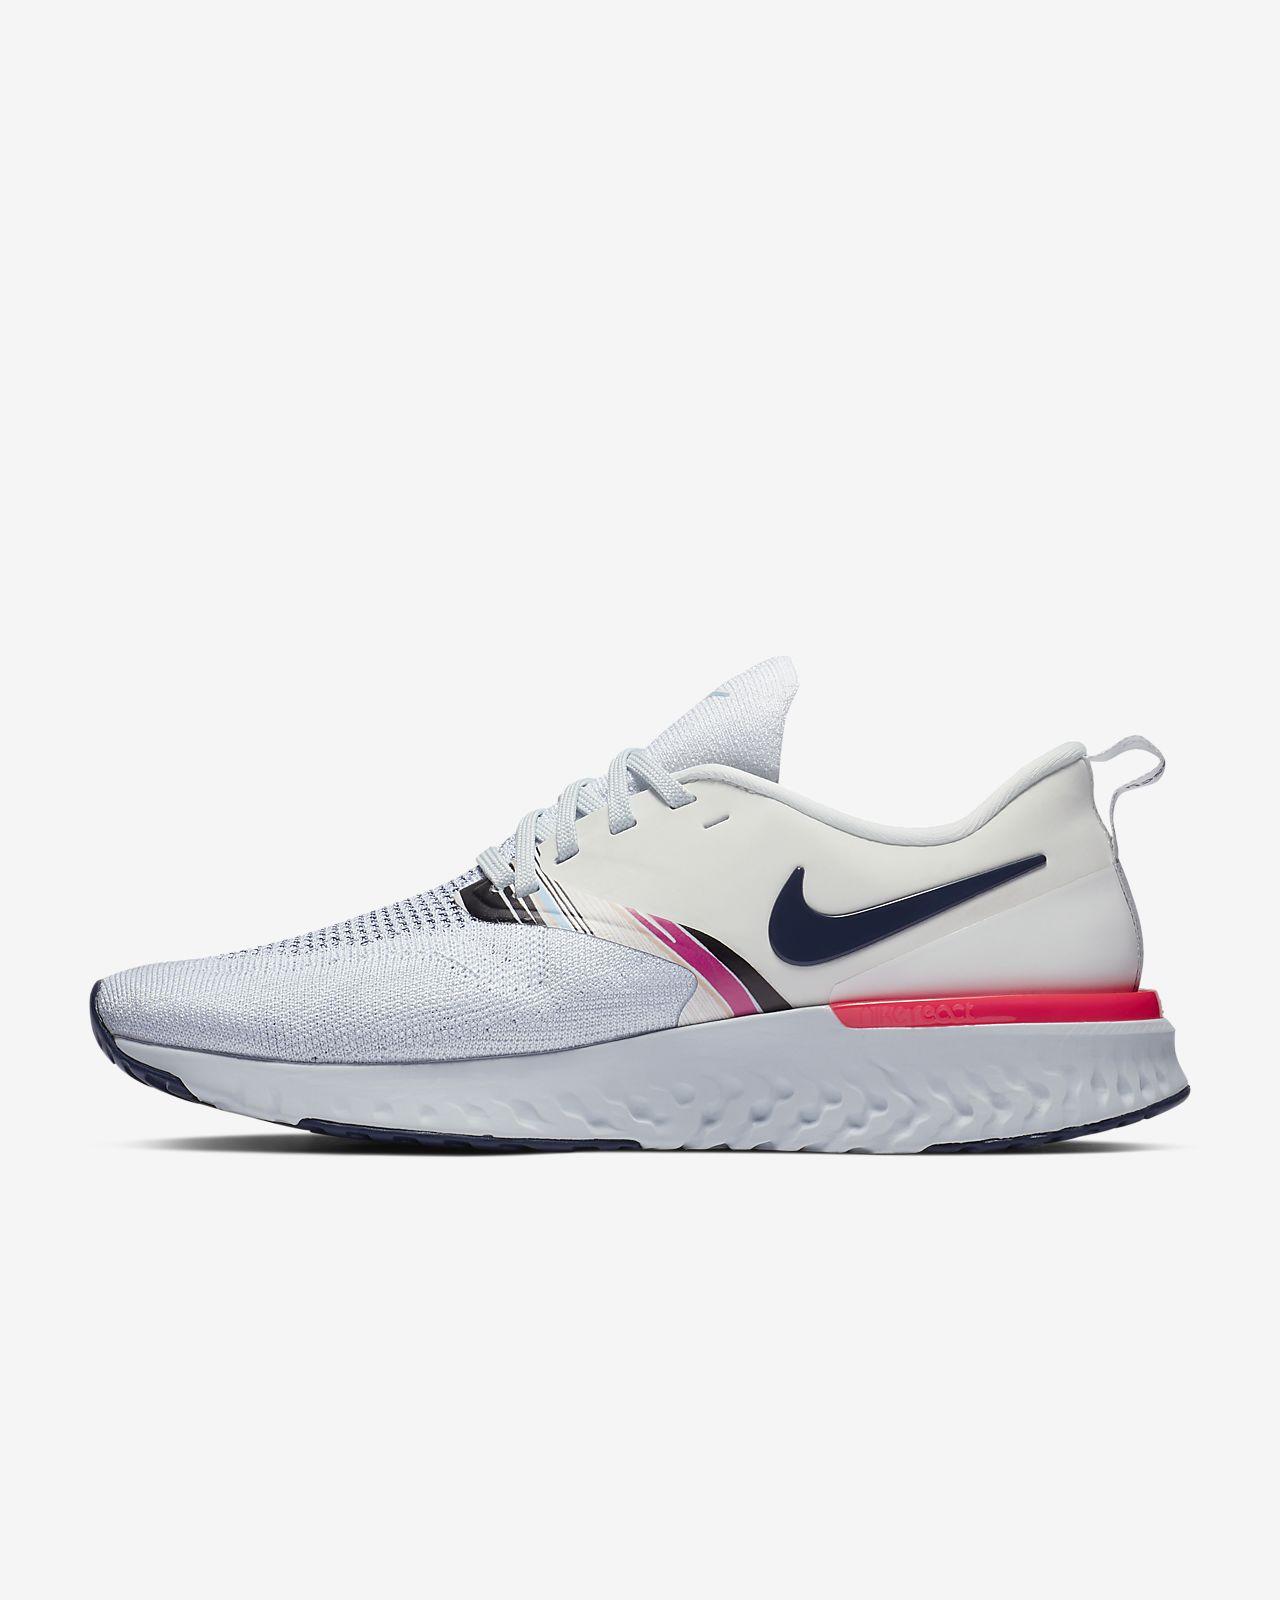 new products ac5ff b2c2e ... Löparsko Nike Odyssey React Flyknit 2 Premium för kvinnor